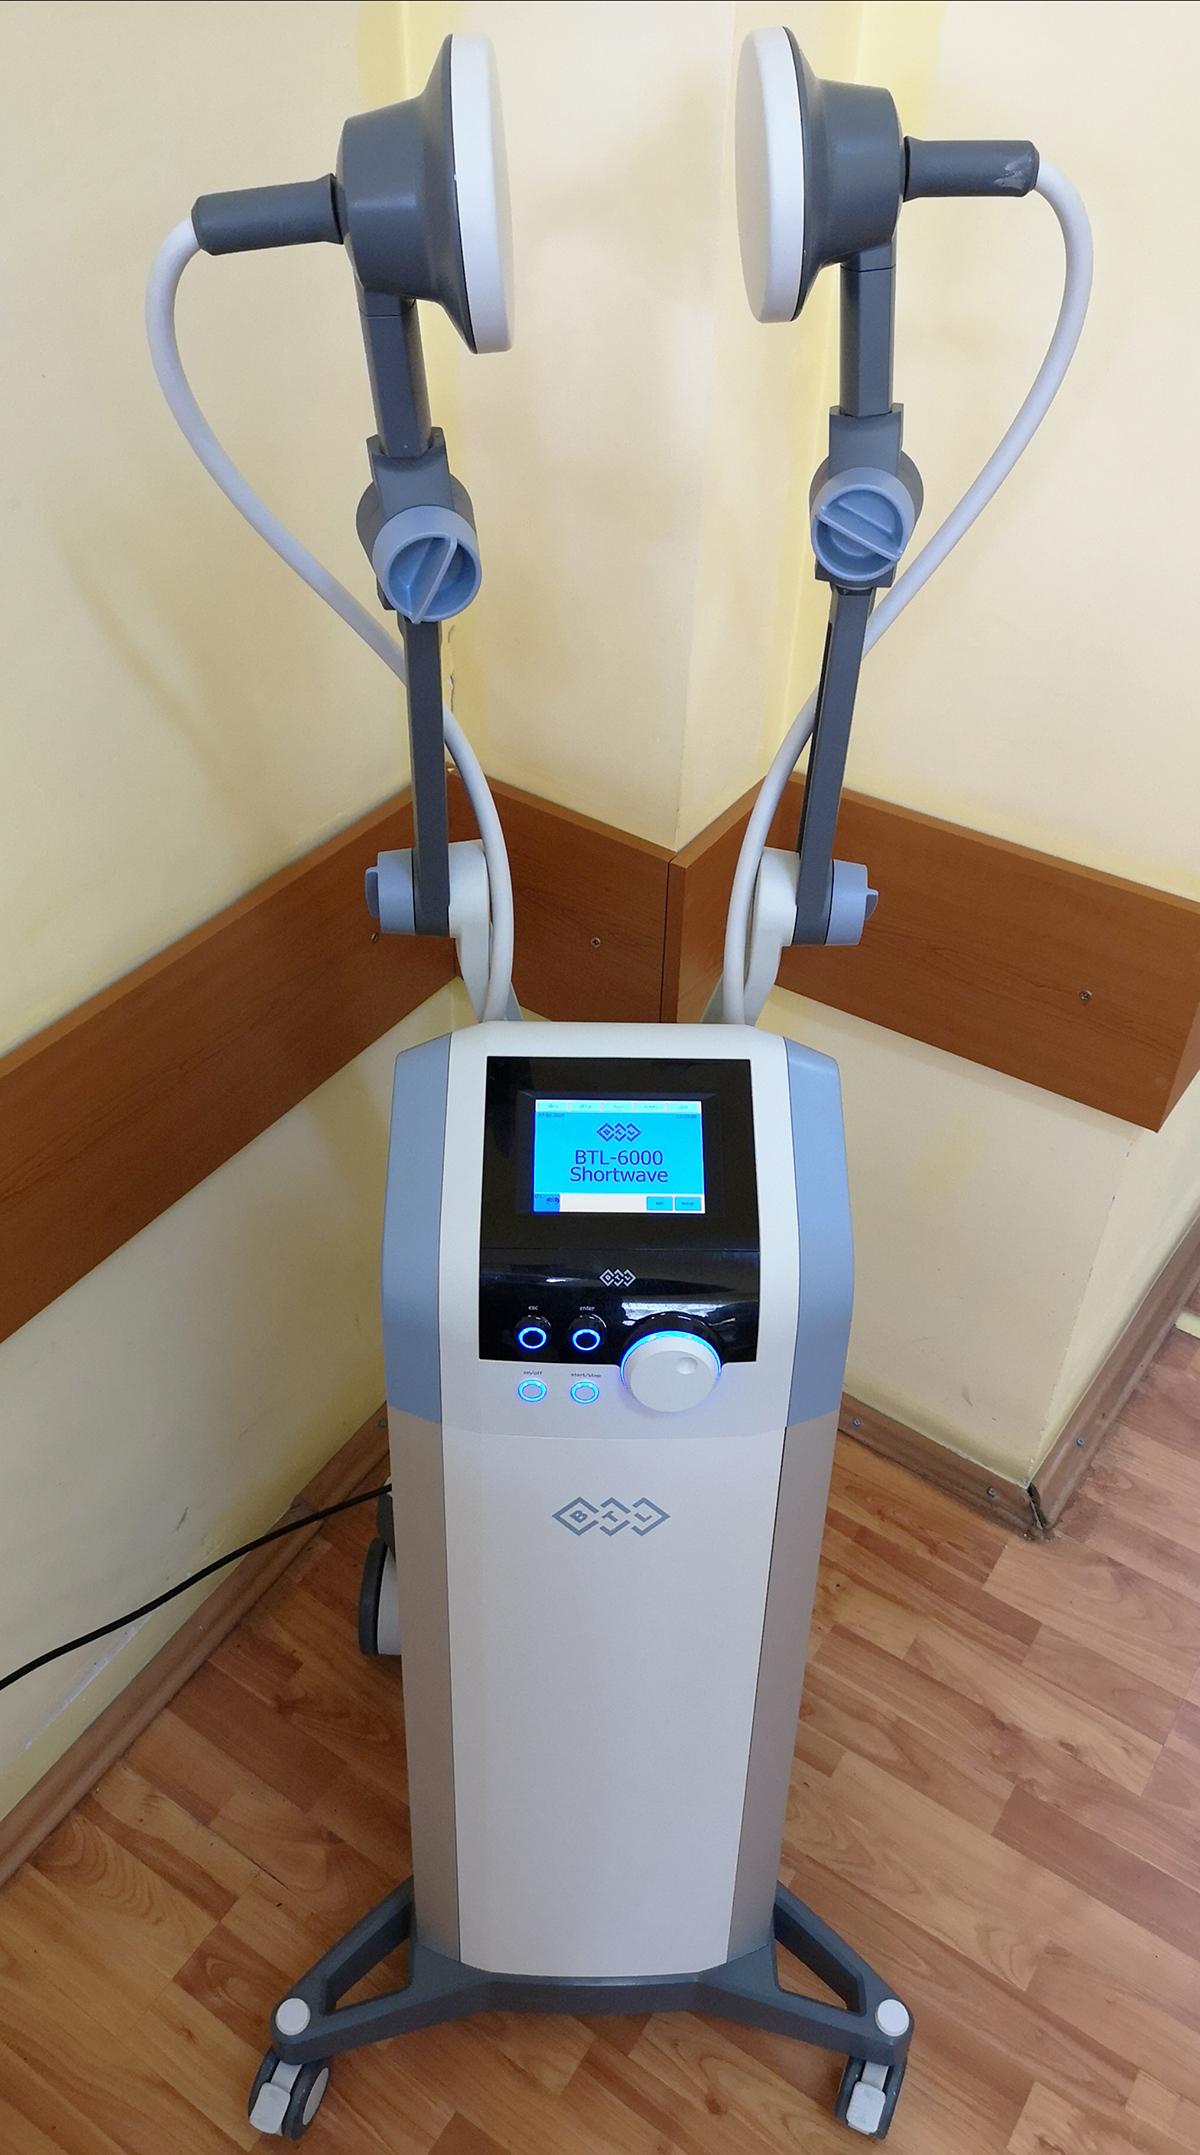 Terapie cu unde scurte BTL 6000 Shortwave 400